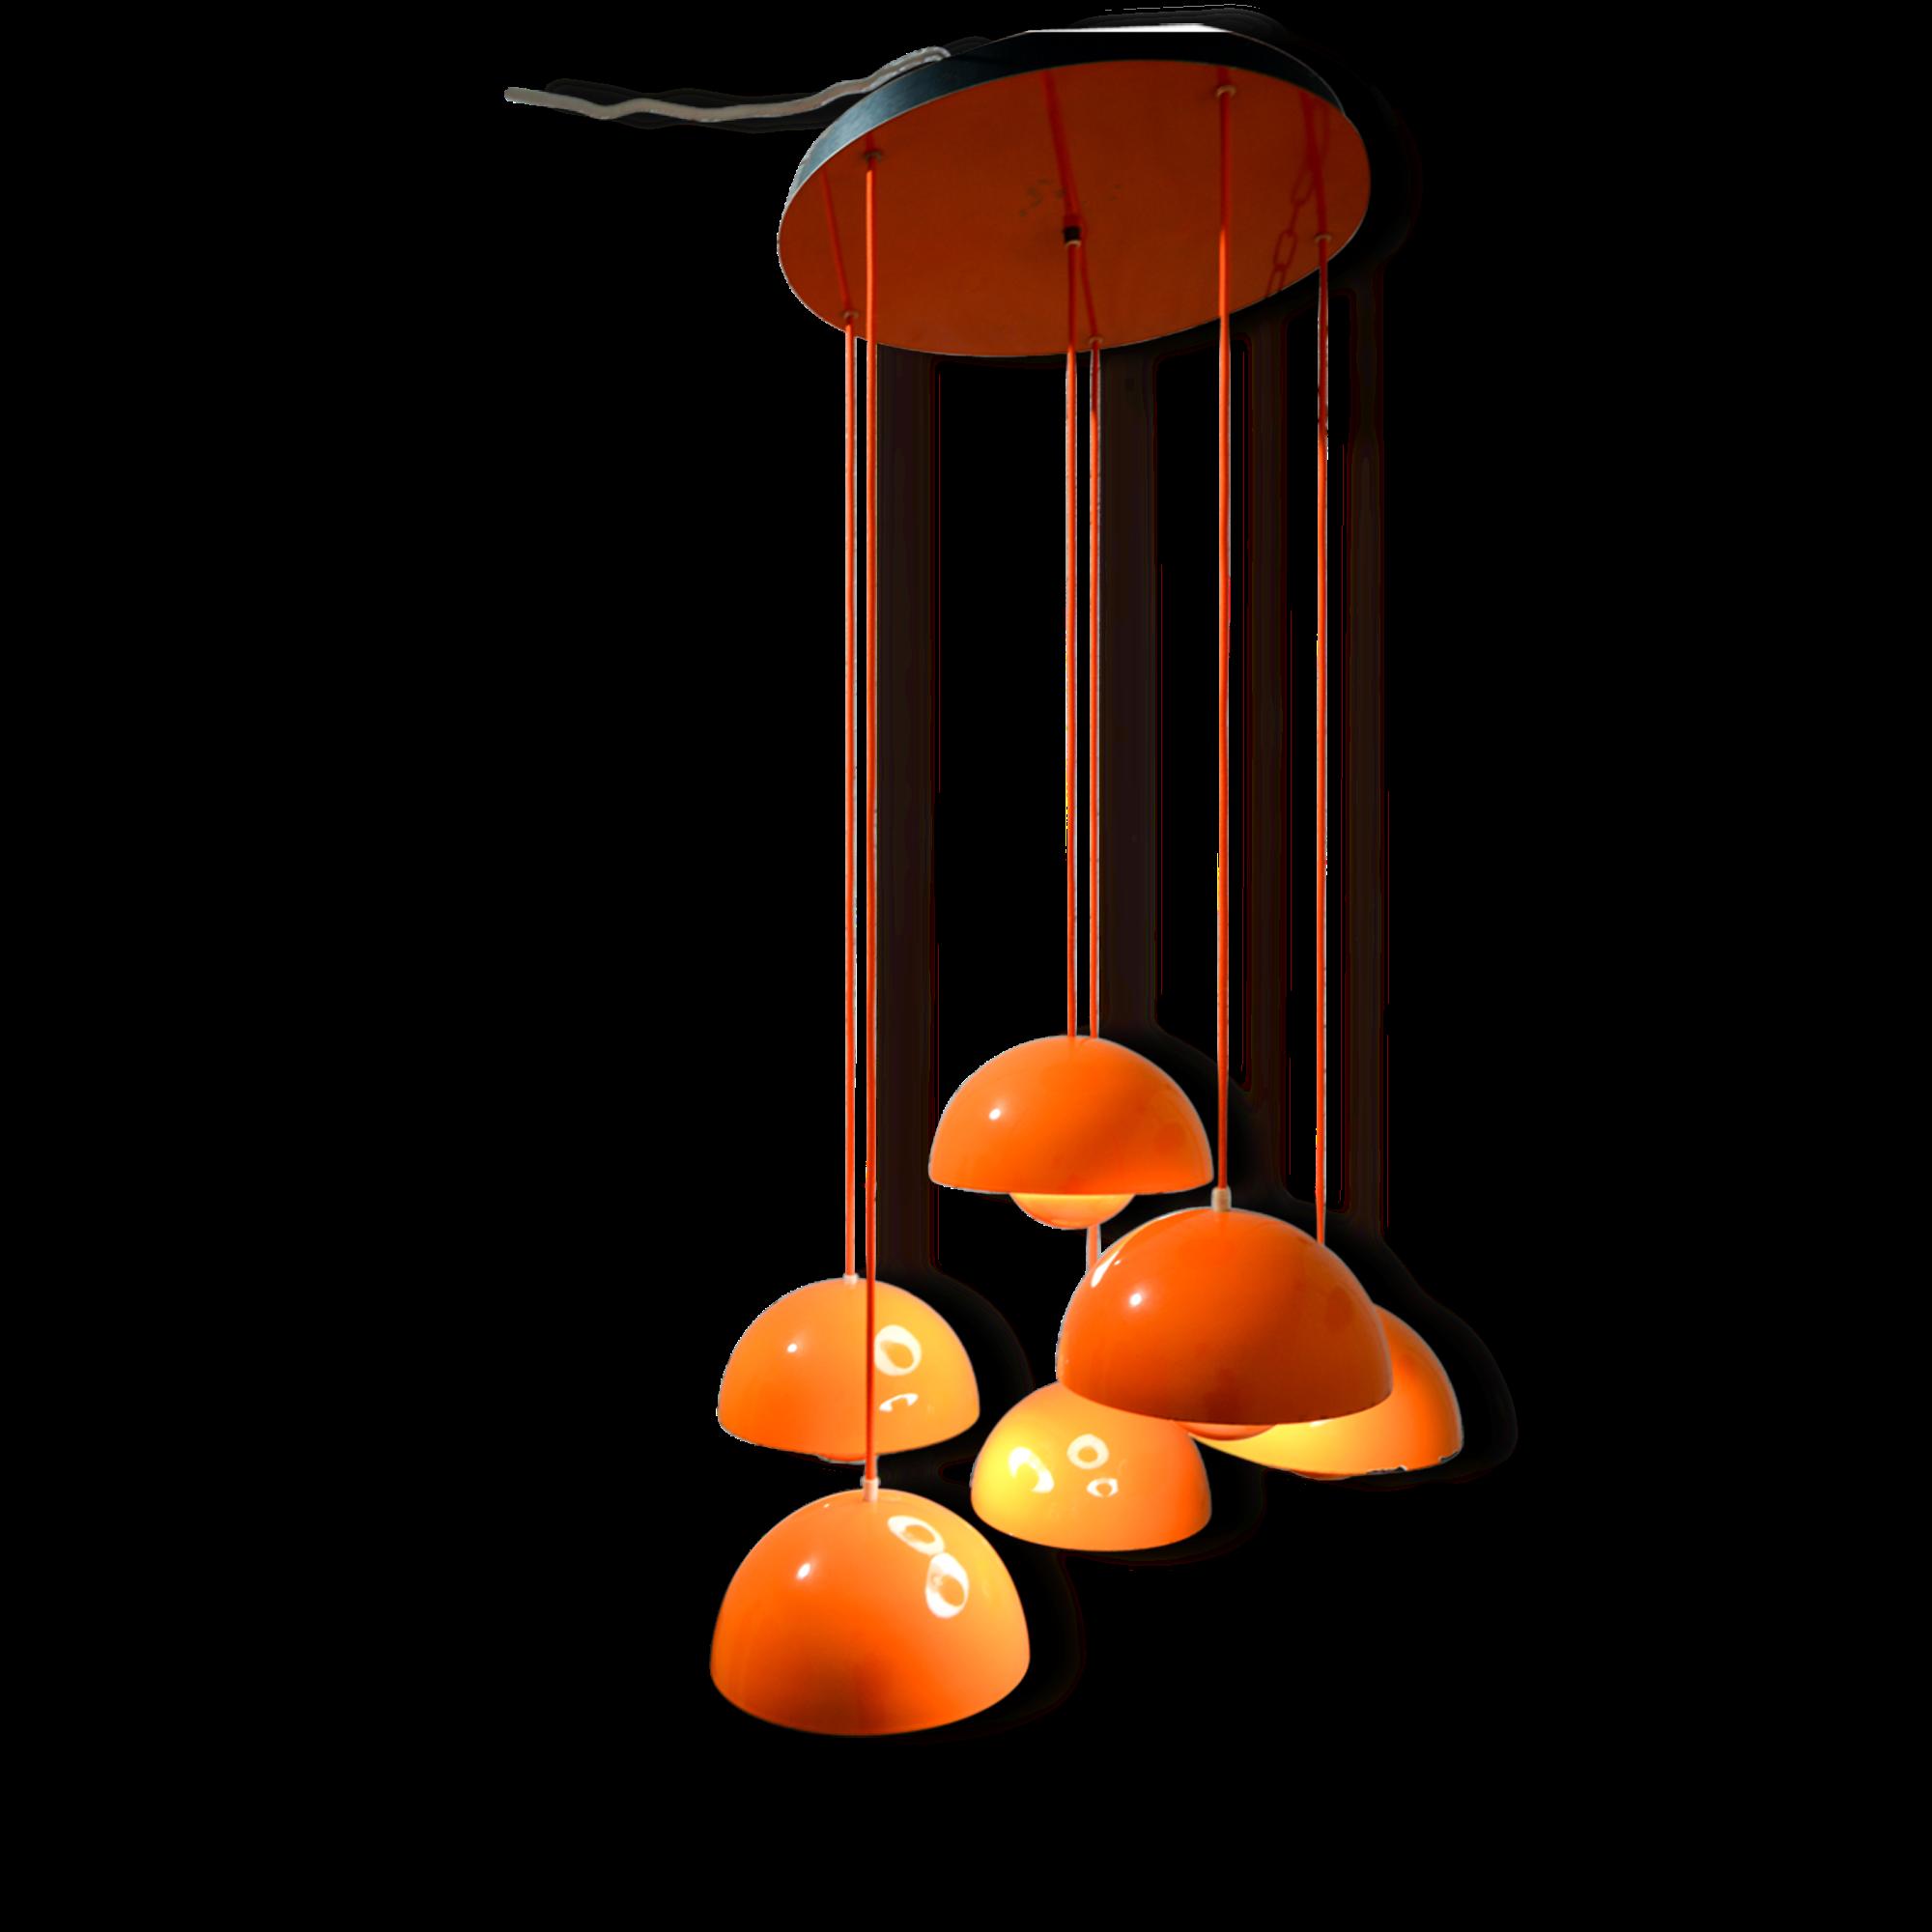 Suspension flower pot verner panton orange, ed poulsen.